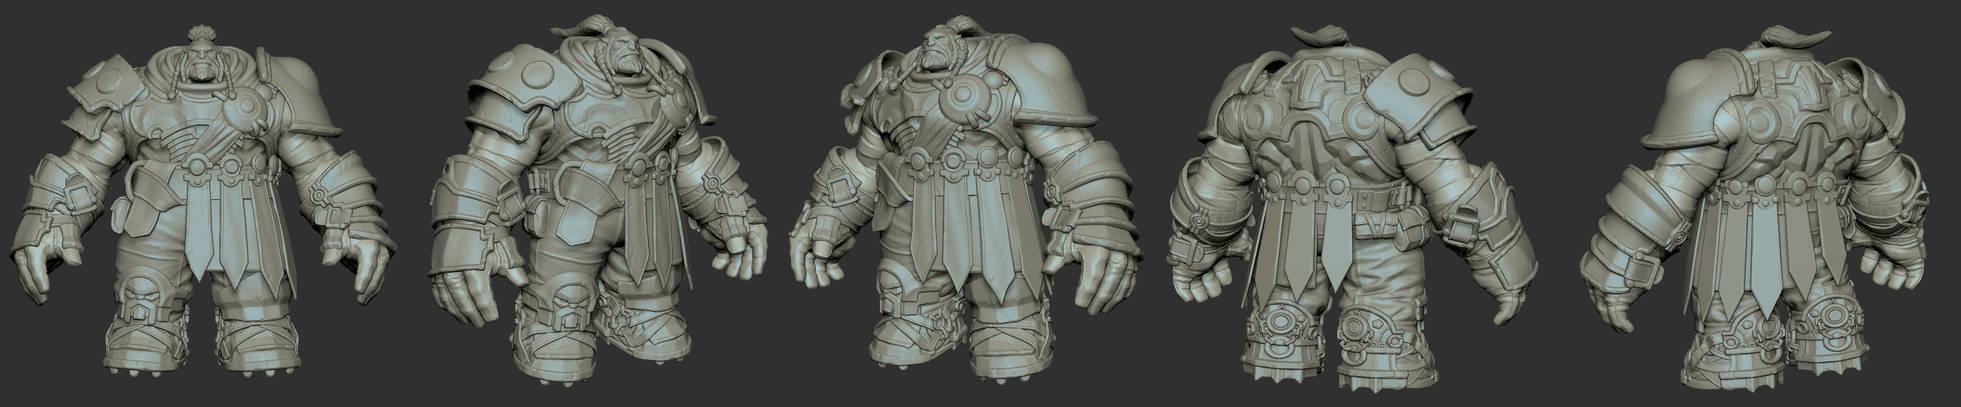 Darksiders II Warrior Zbrush Model